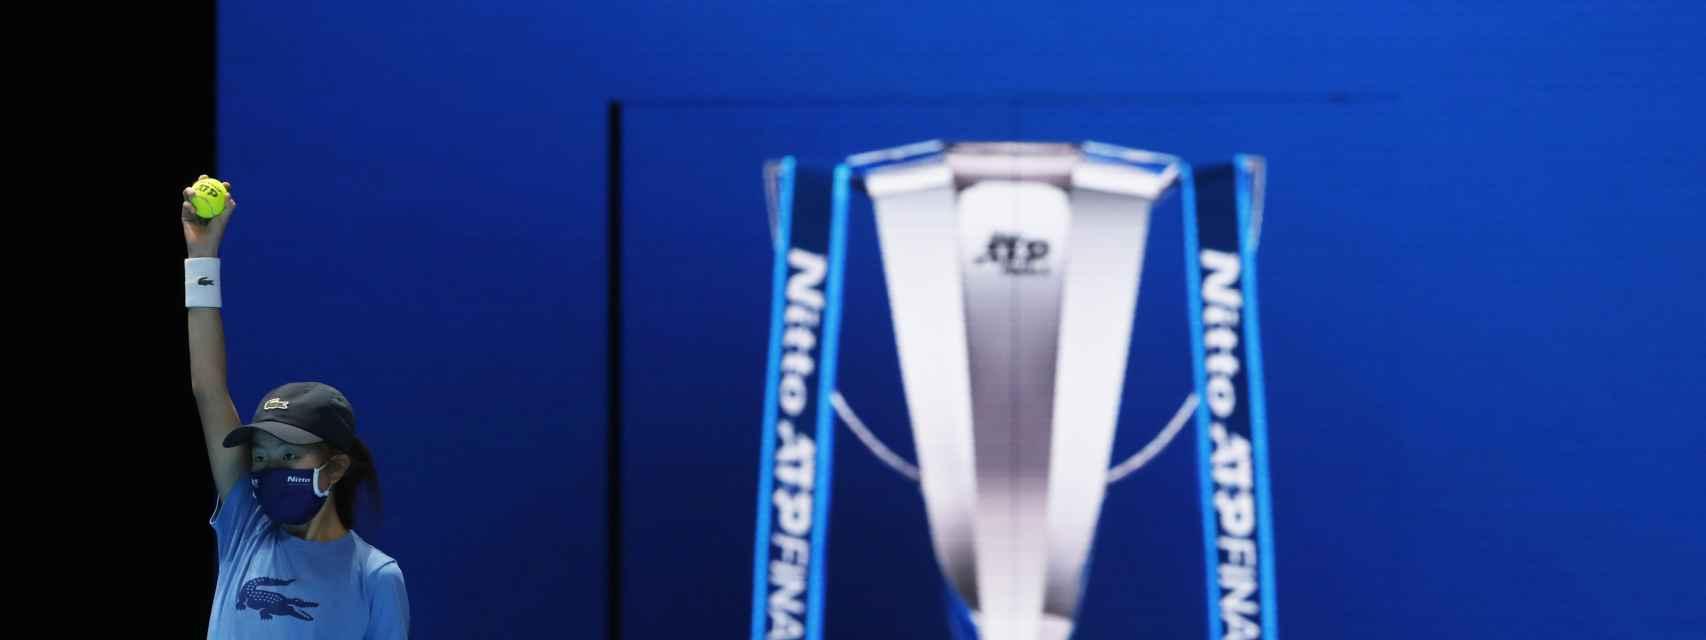 Daniil Medvédev - Dominic Thiem, la final de las ATP Finals de Londres